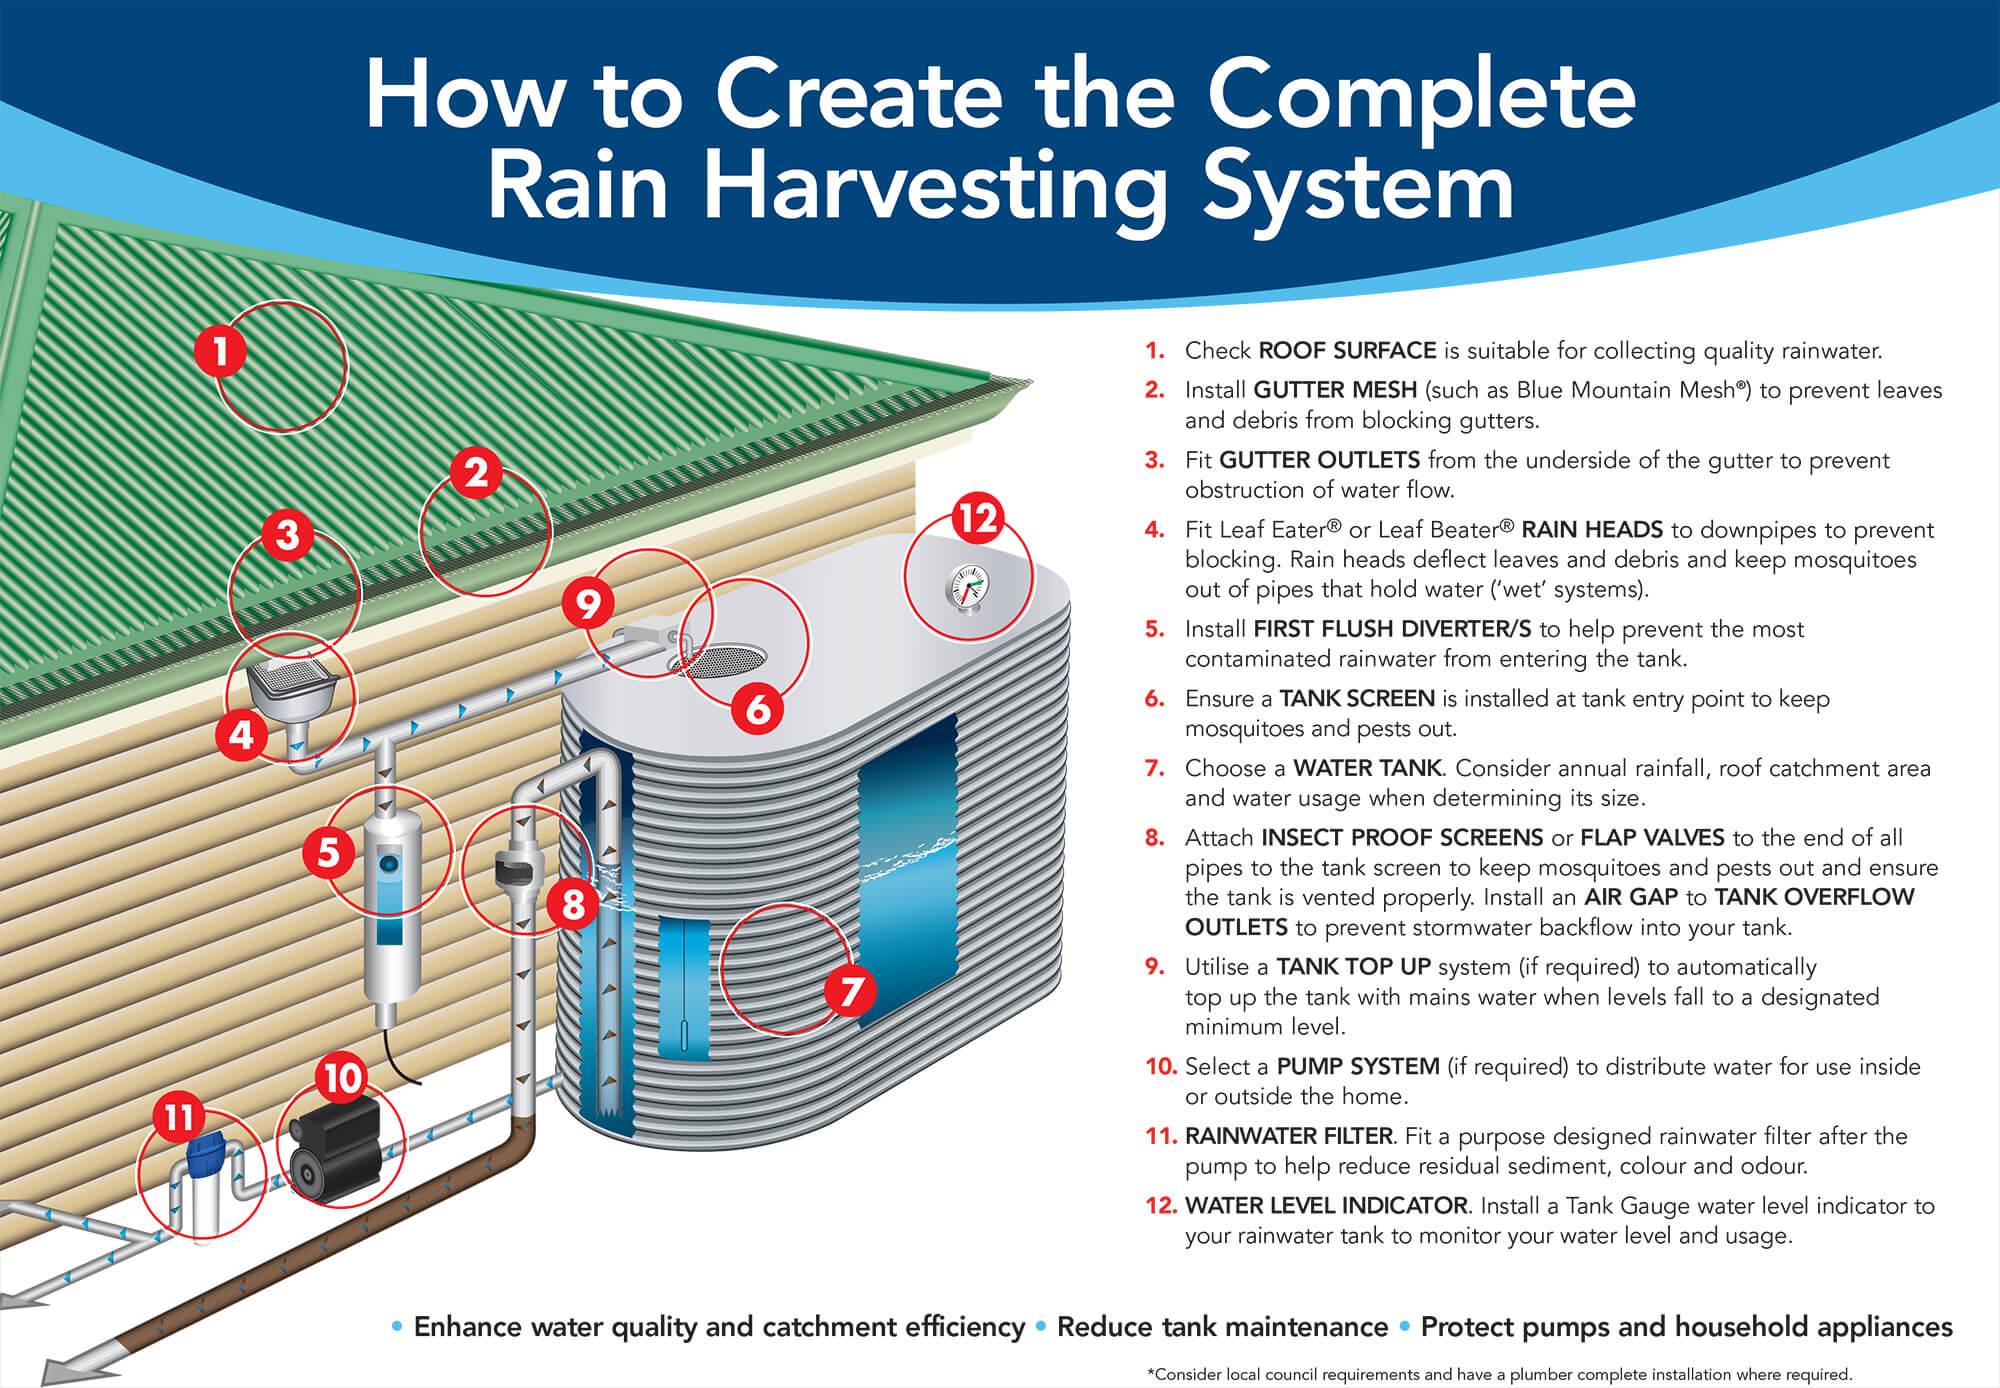 12 Steps to Rain Harvesting